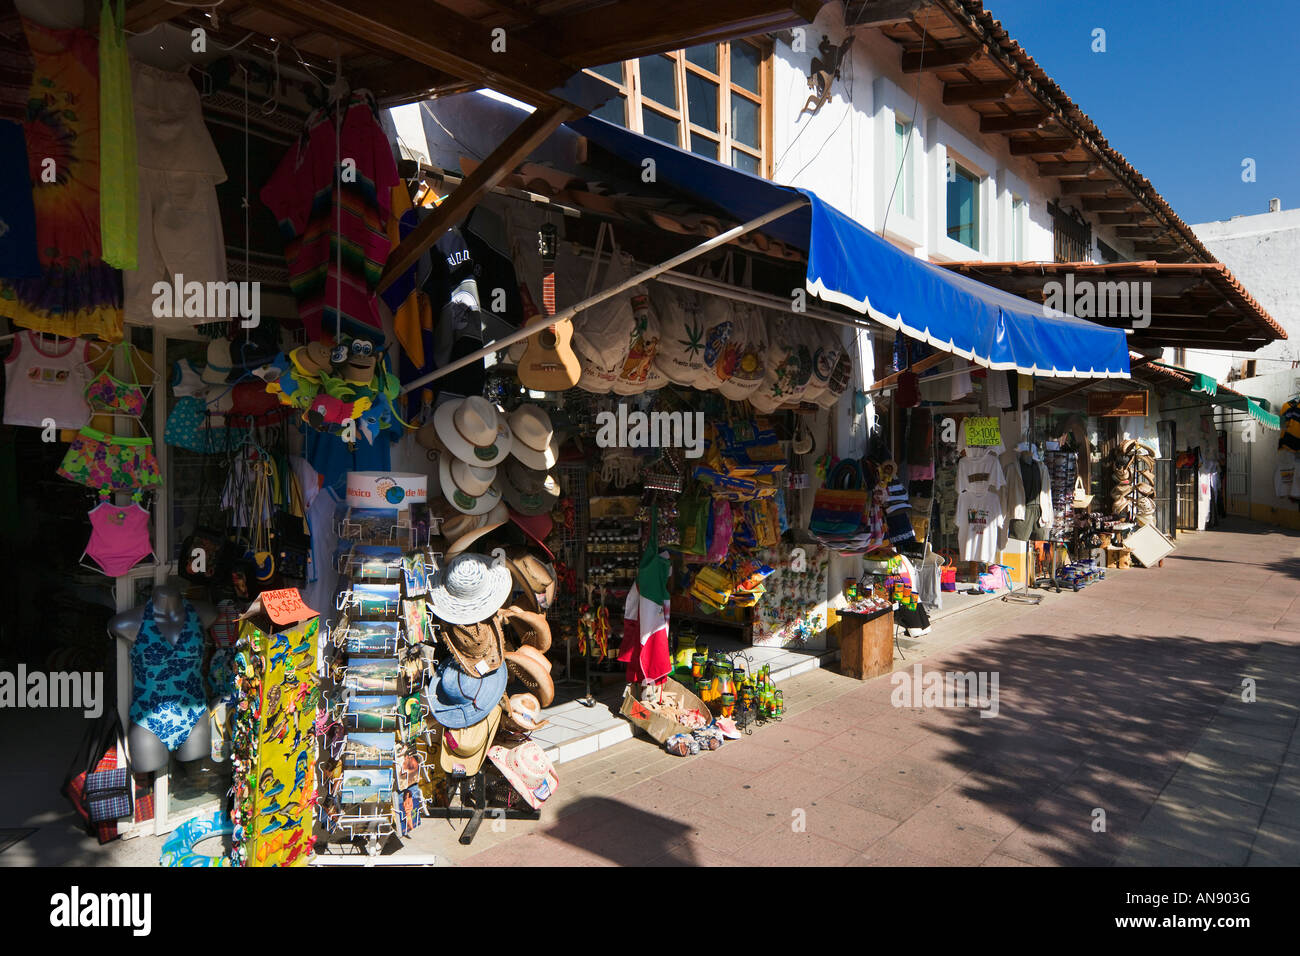 Shops In Plaza Malecon Flea Market Malecon Old Town